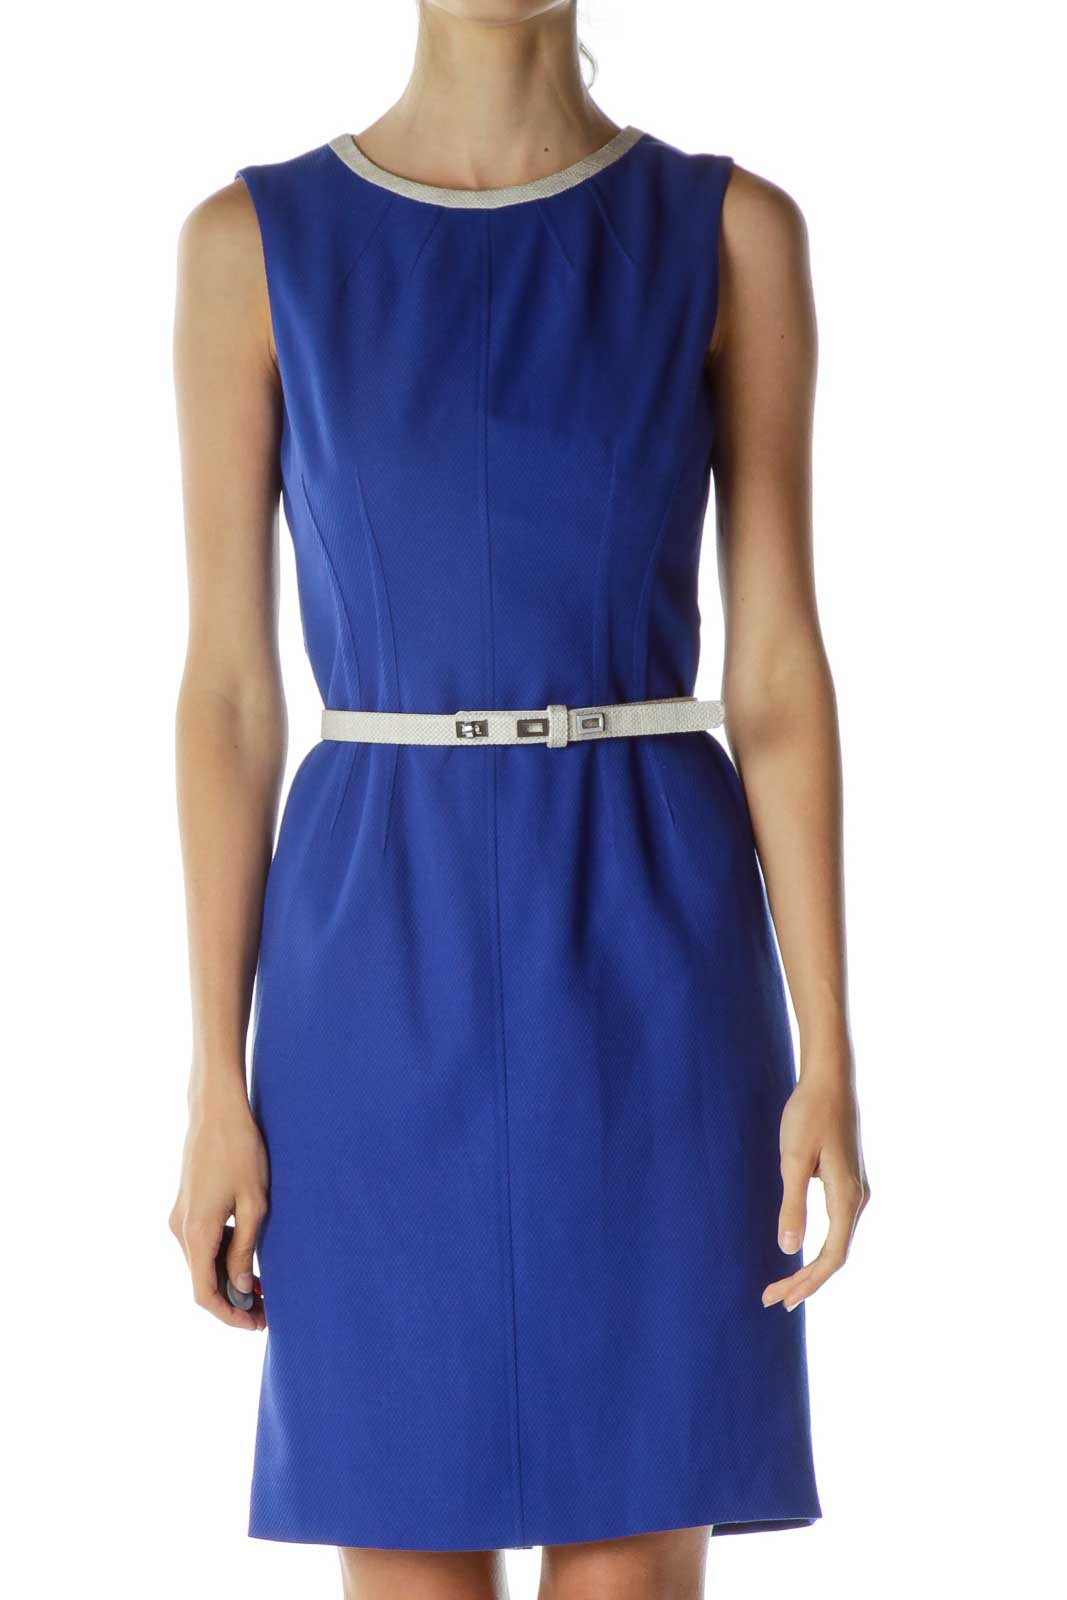 Blue Belted Sheath Dress Front